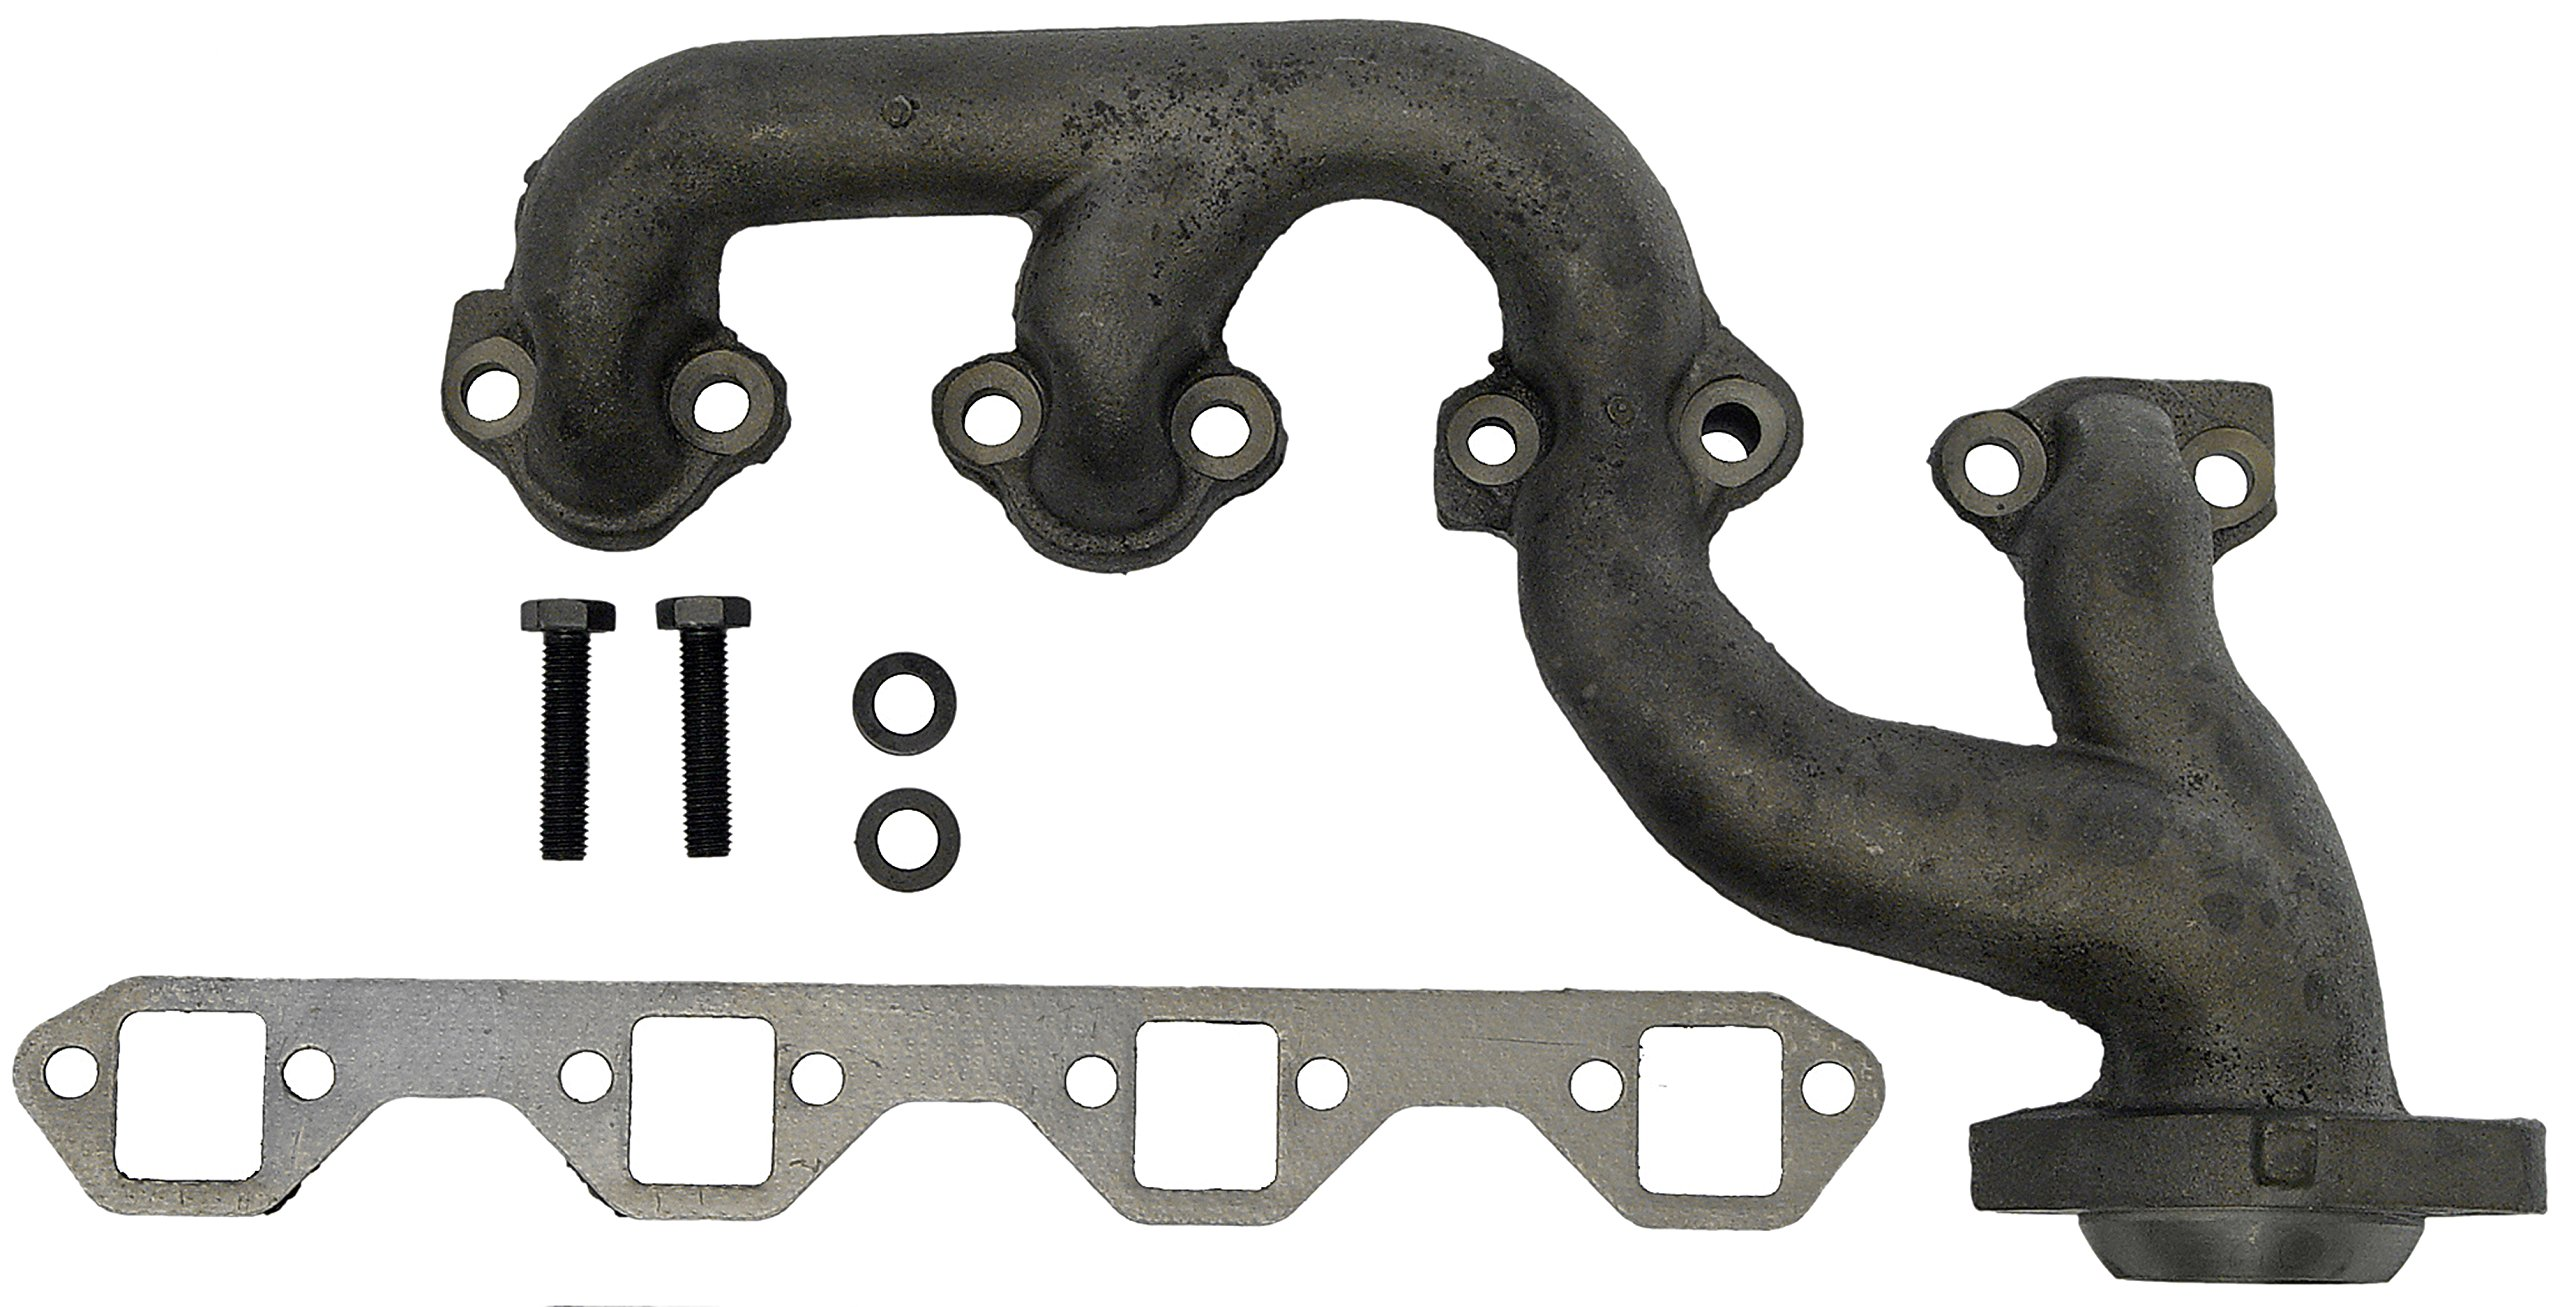 Dorman 674-334 Exhaust Manifold Kit